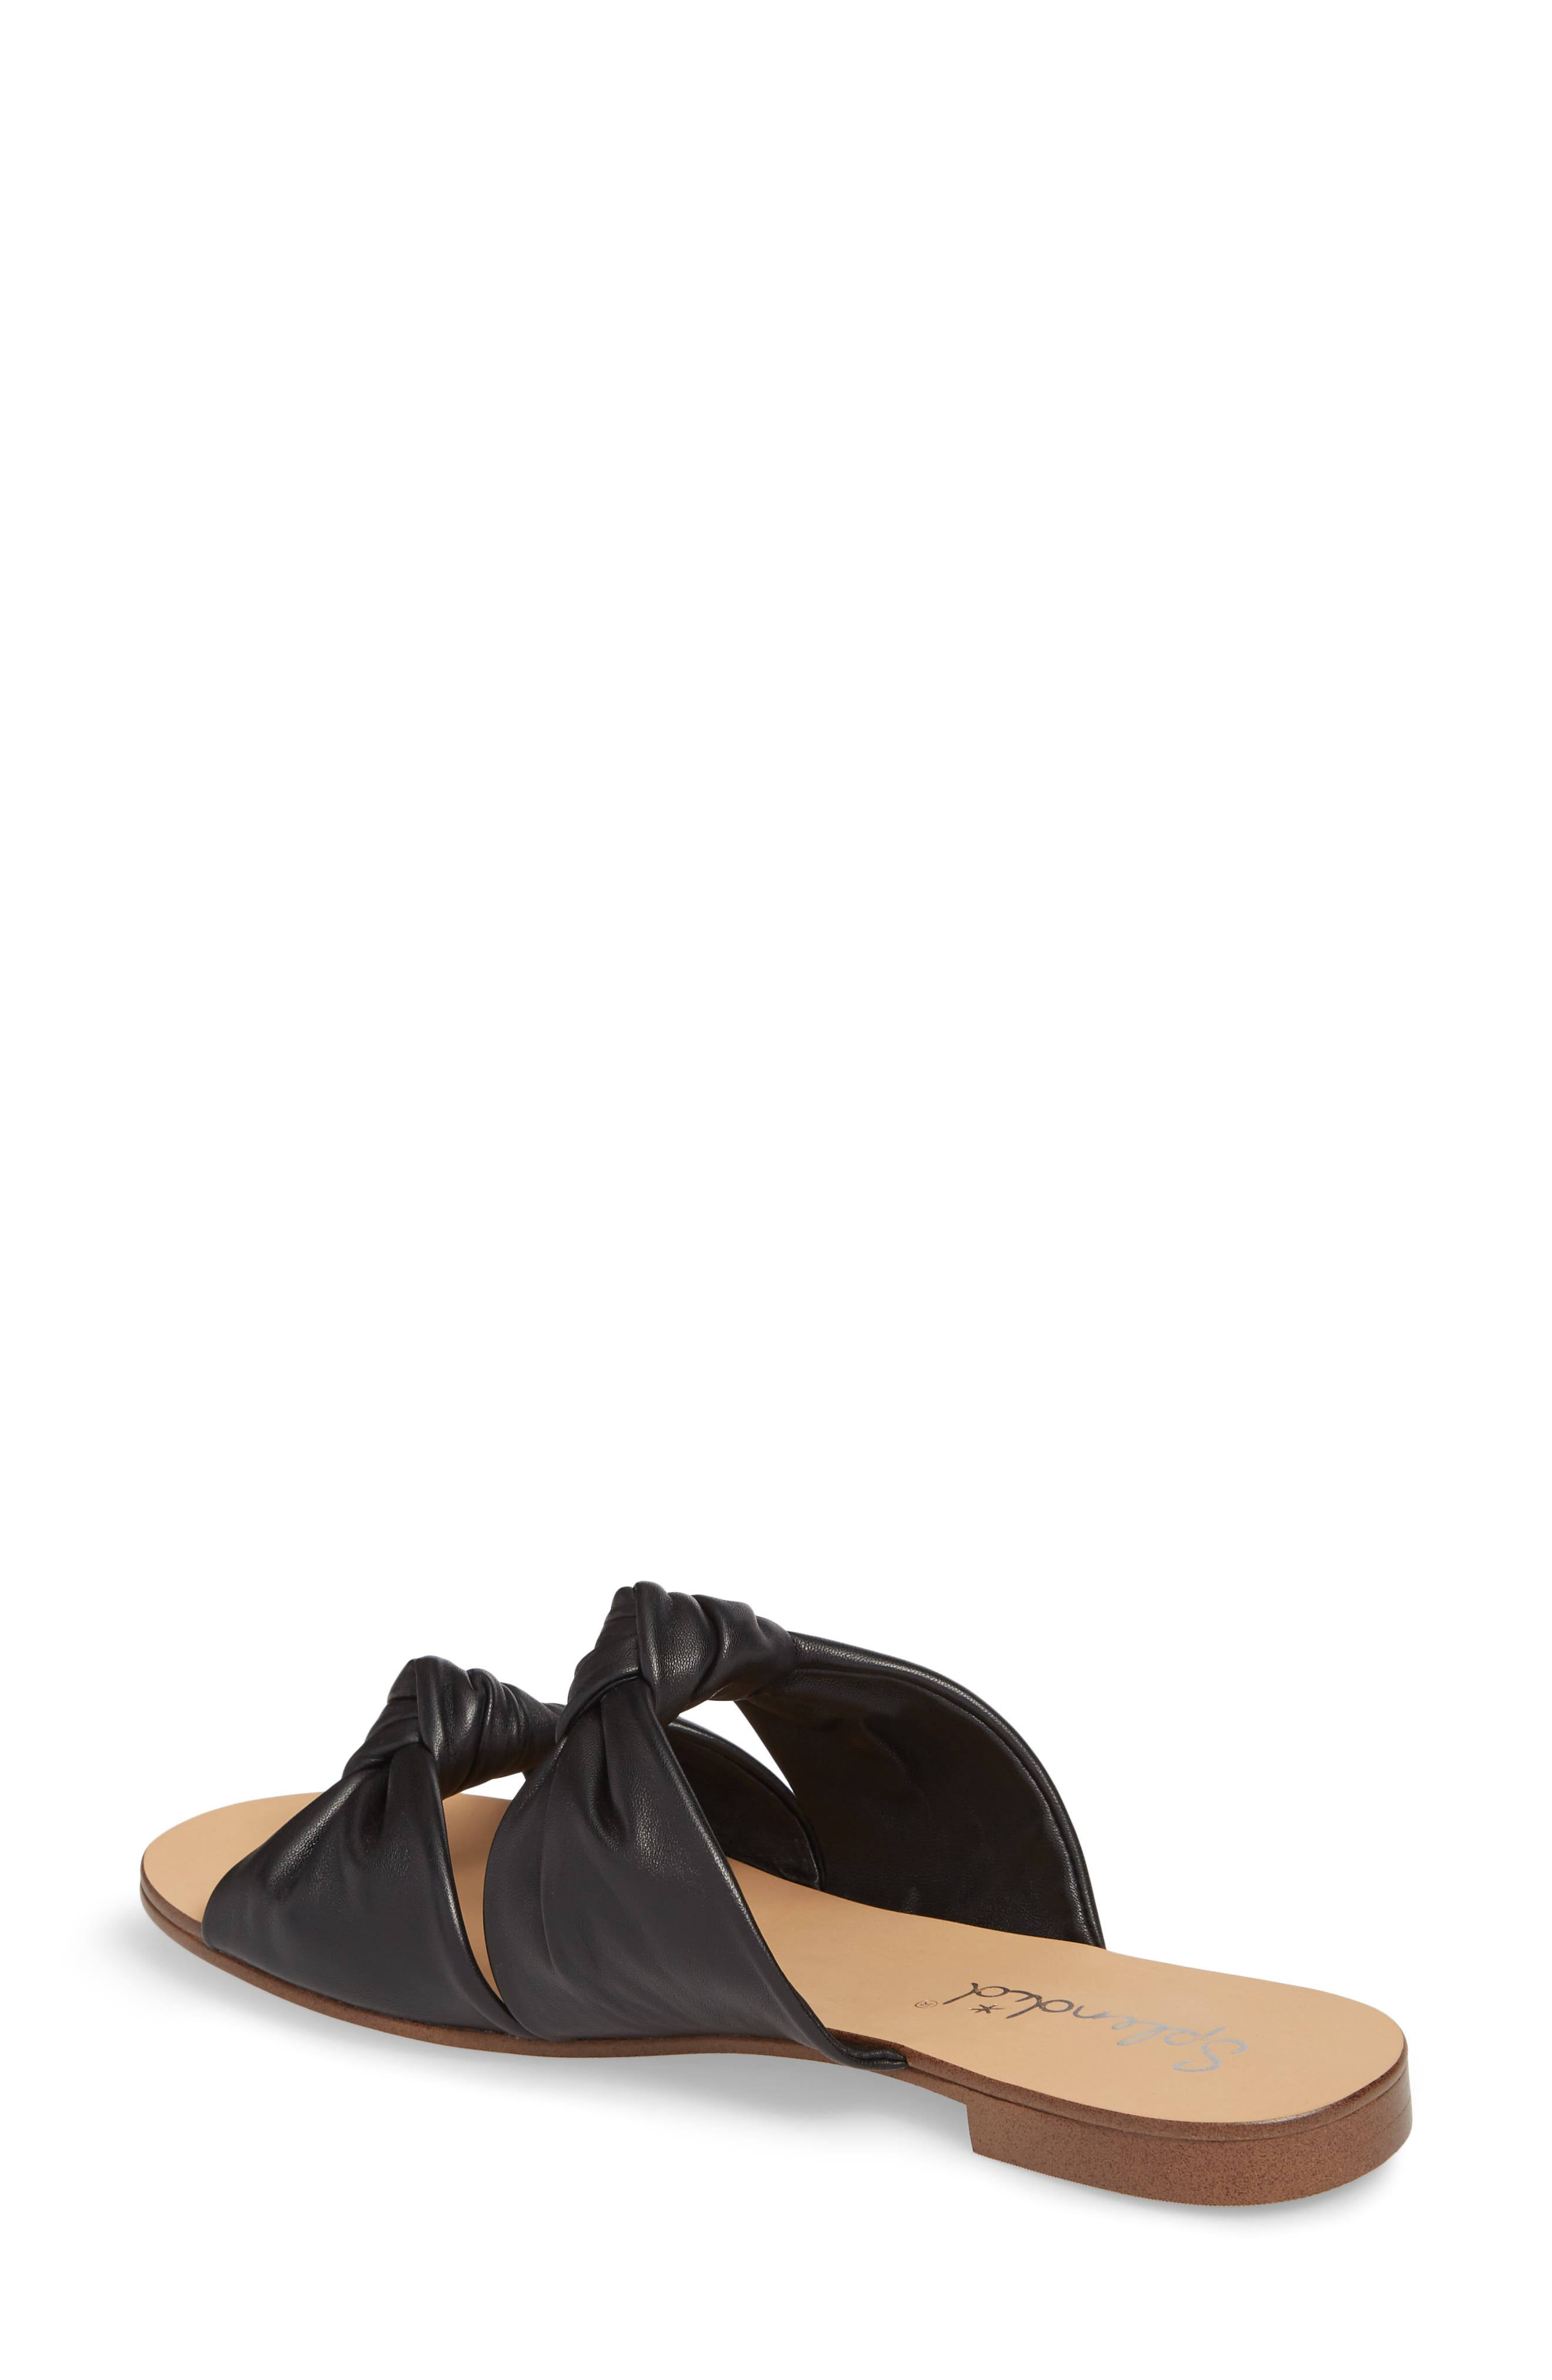 Barton Double Knotted Slide Sandal,                             Alternate thumbnail 2, color,                             BLACK LEATHER